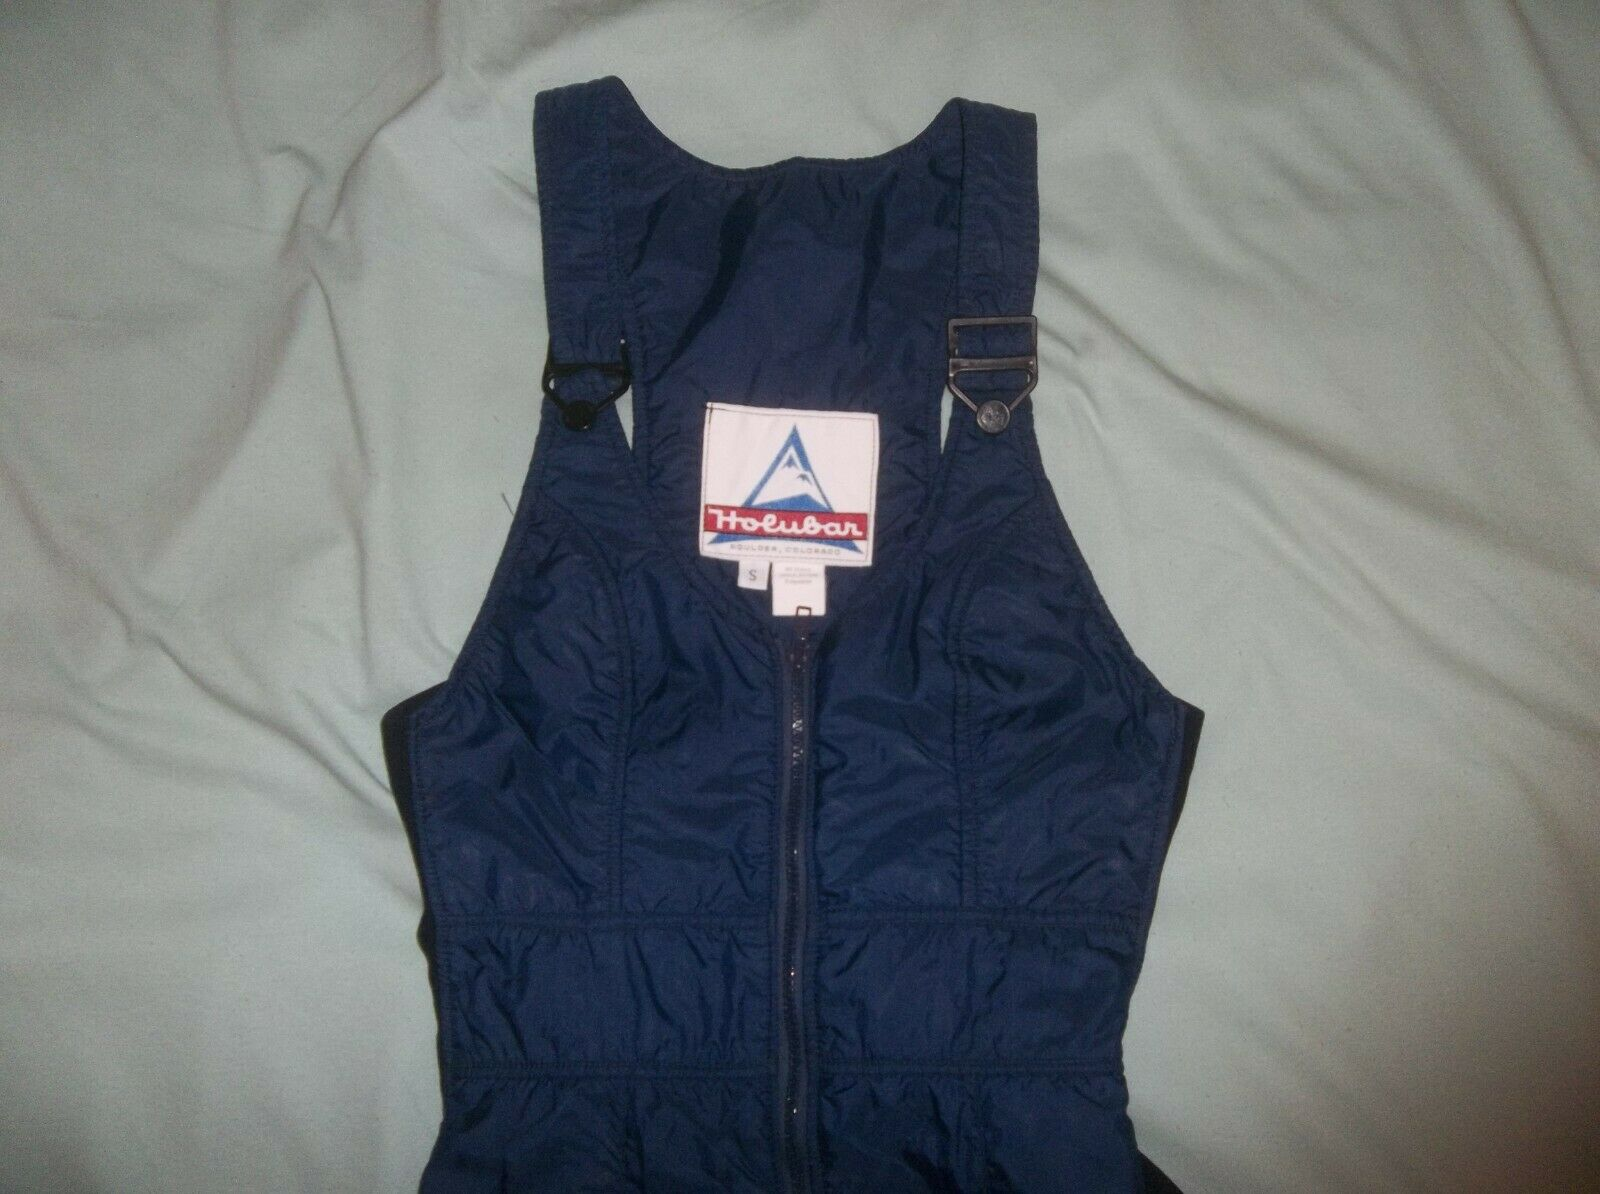 Holubar Vintage Polarguard Bibs Insulated Pants bluee colorado USA Small PERFECT